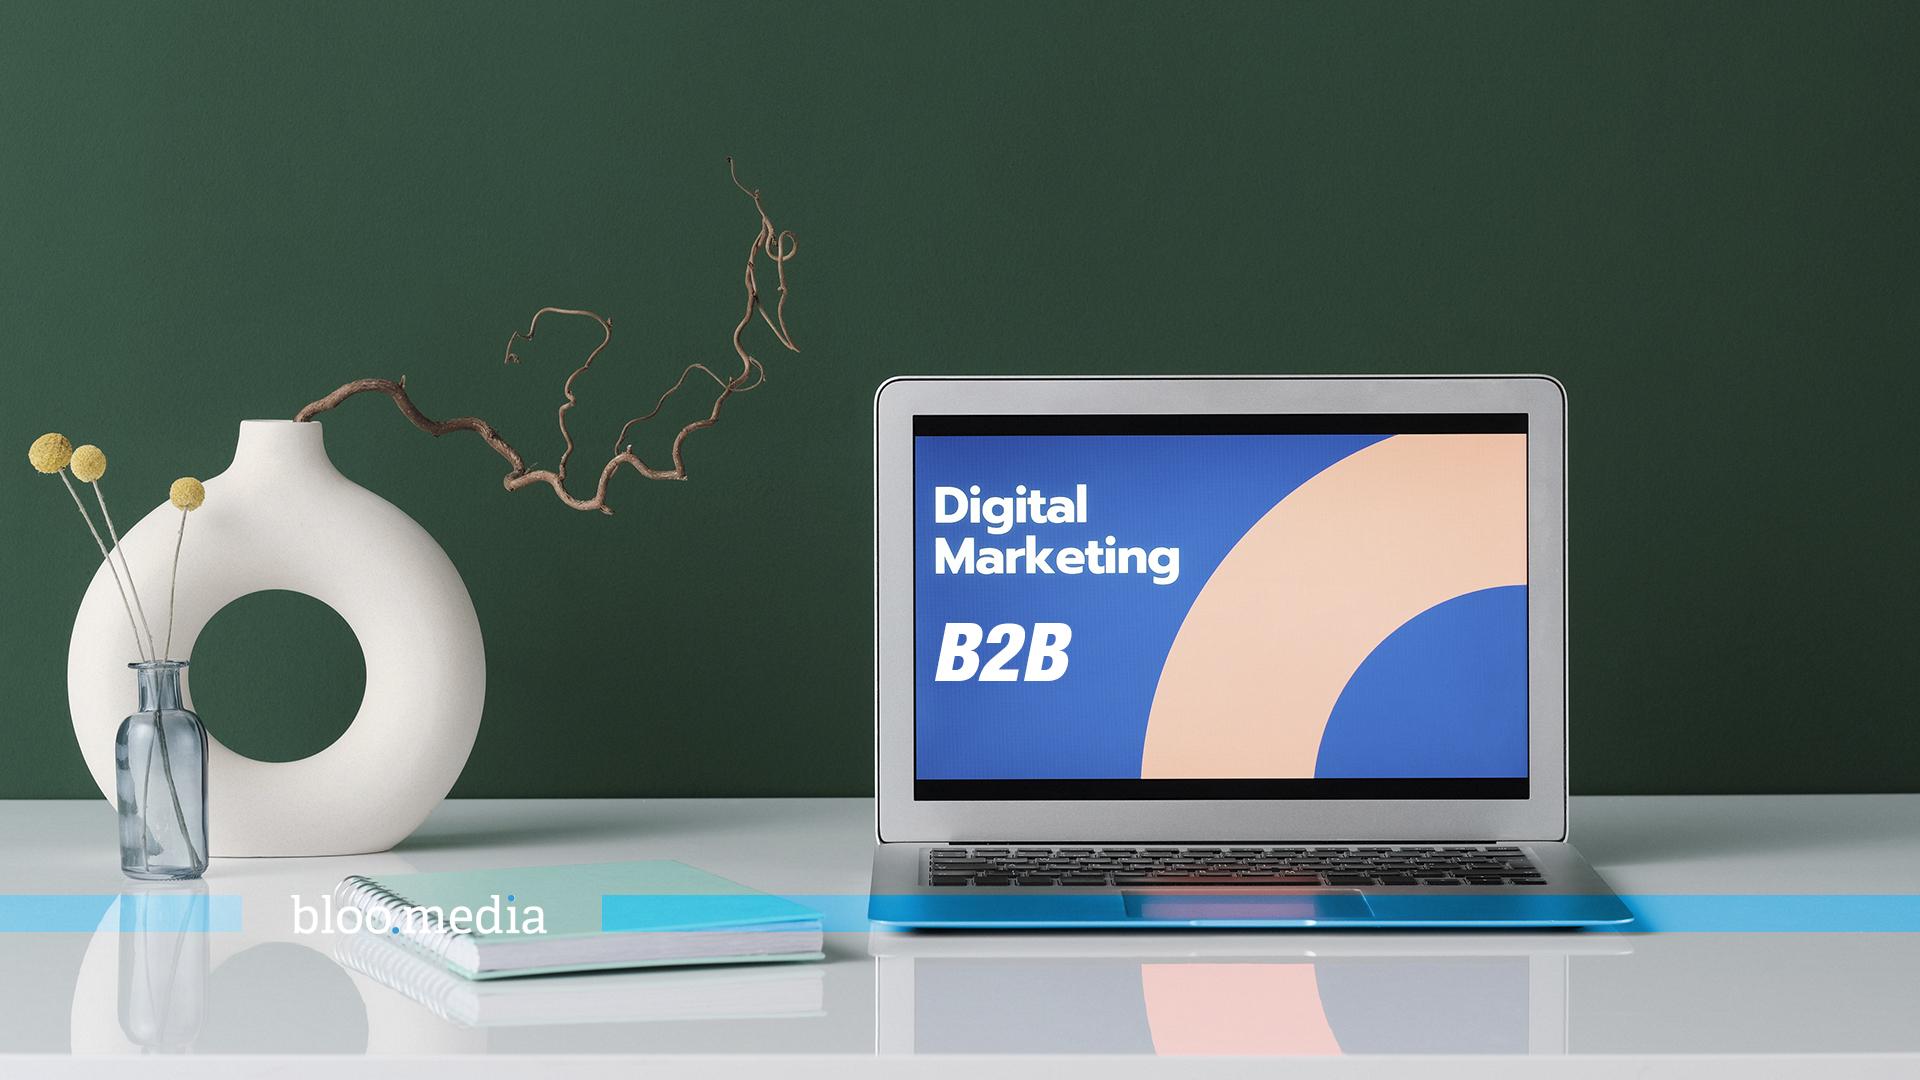 Marketing B2B | Cómo captar clientes B2B [Guía 2021]